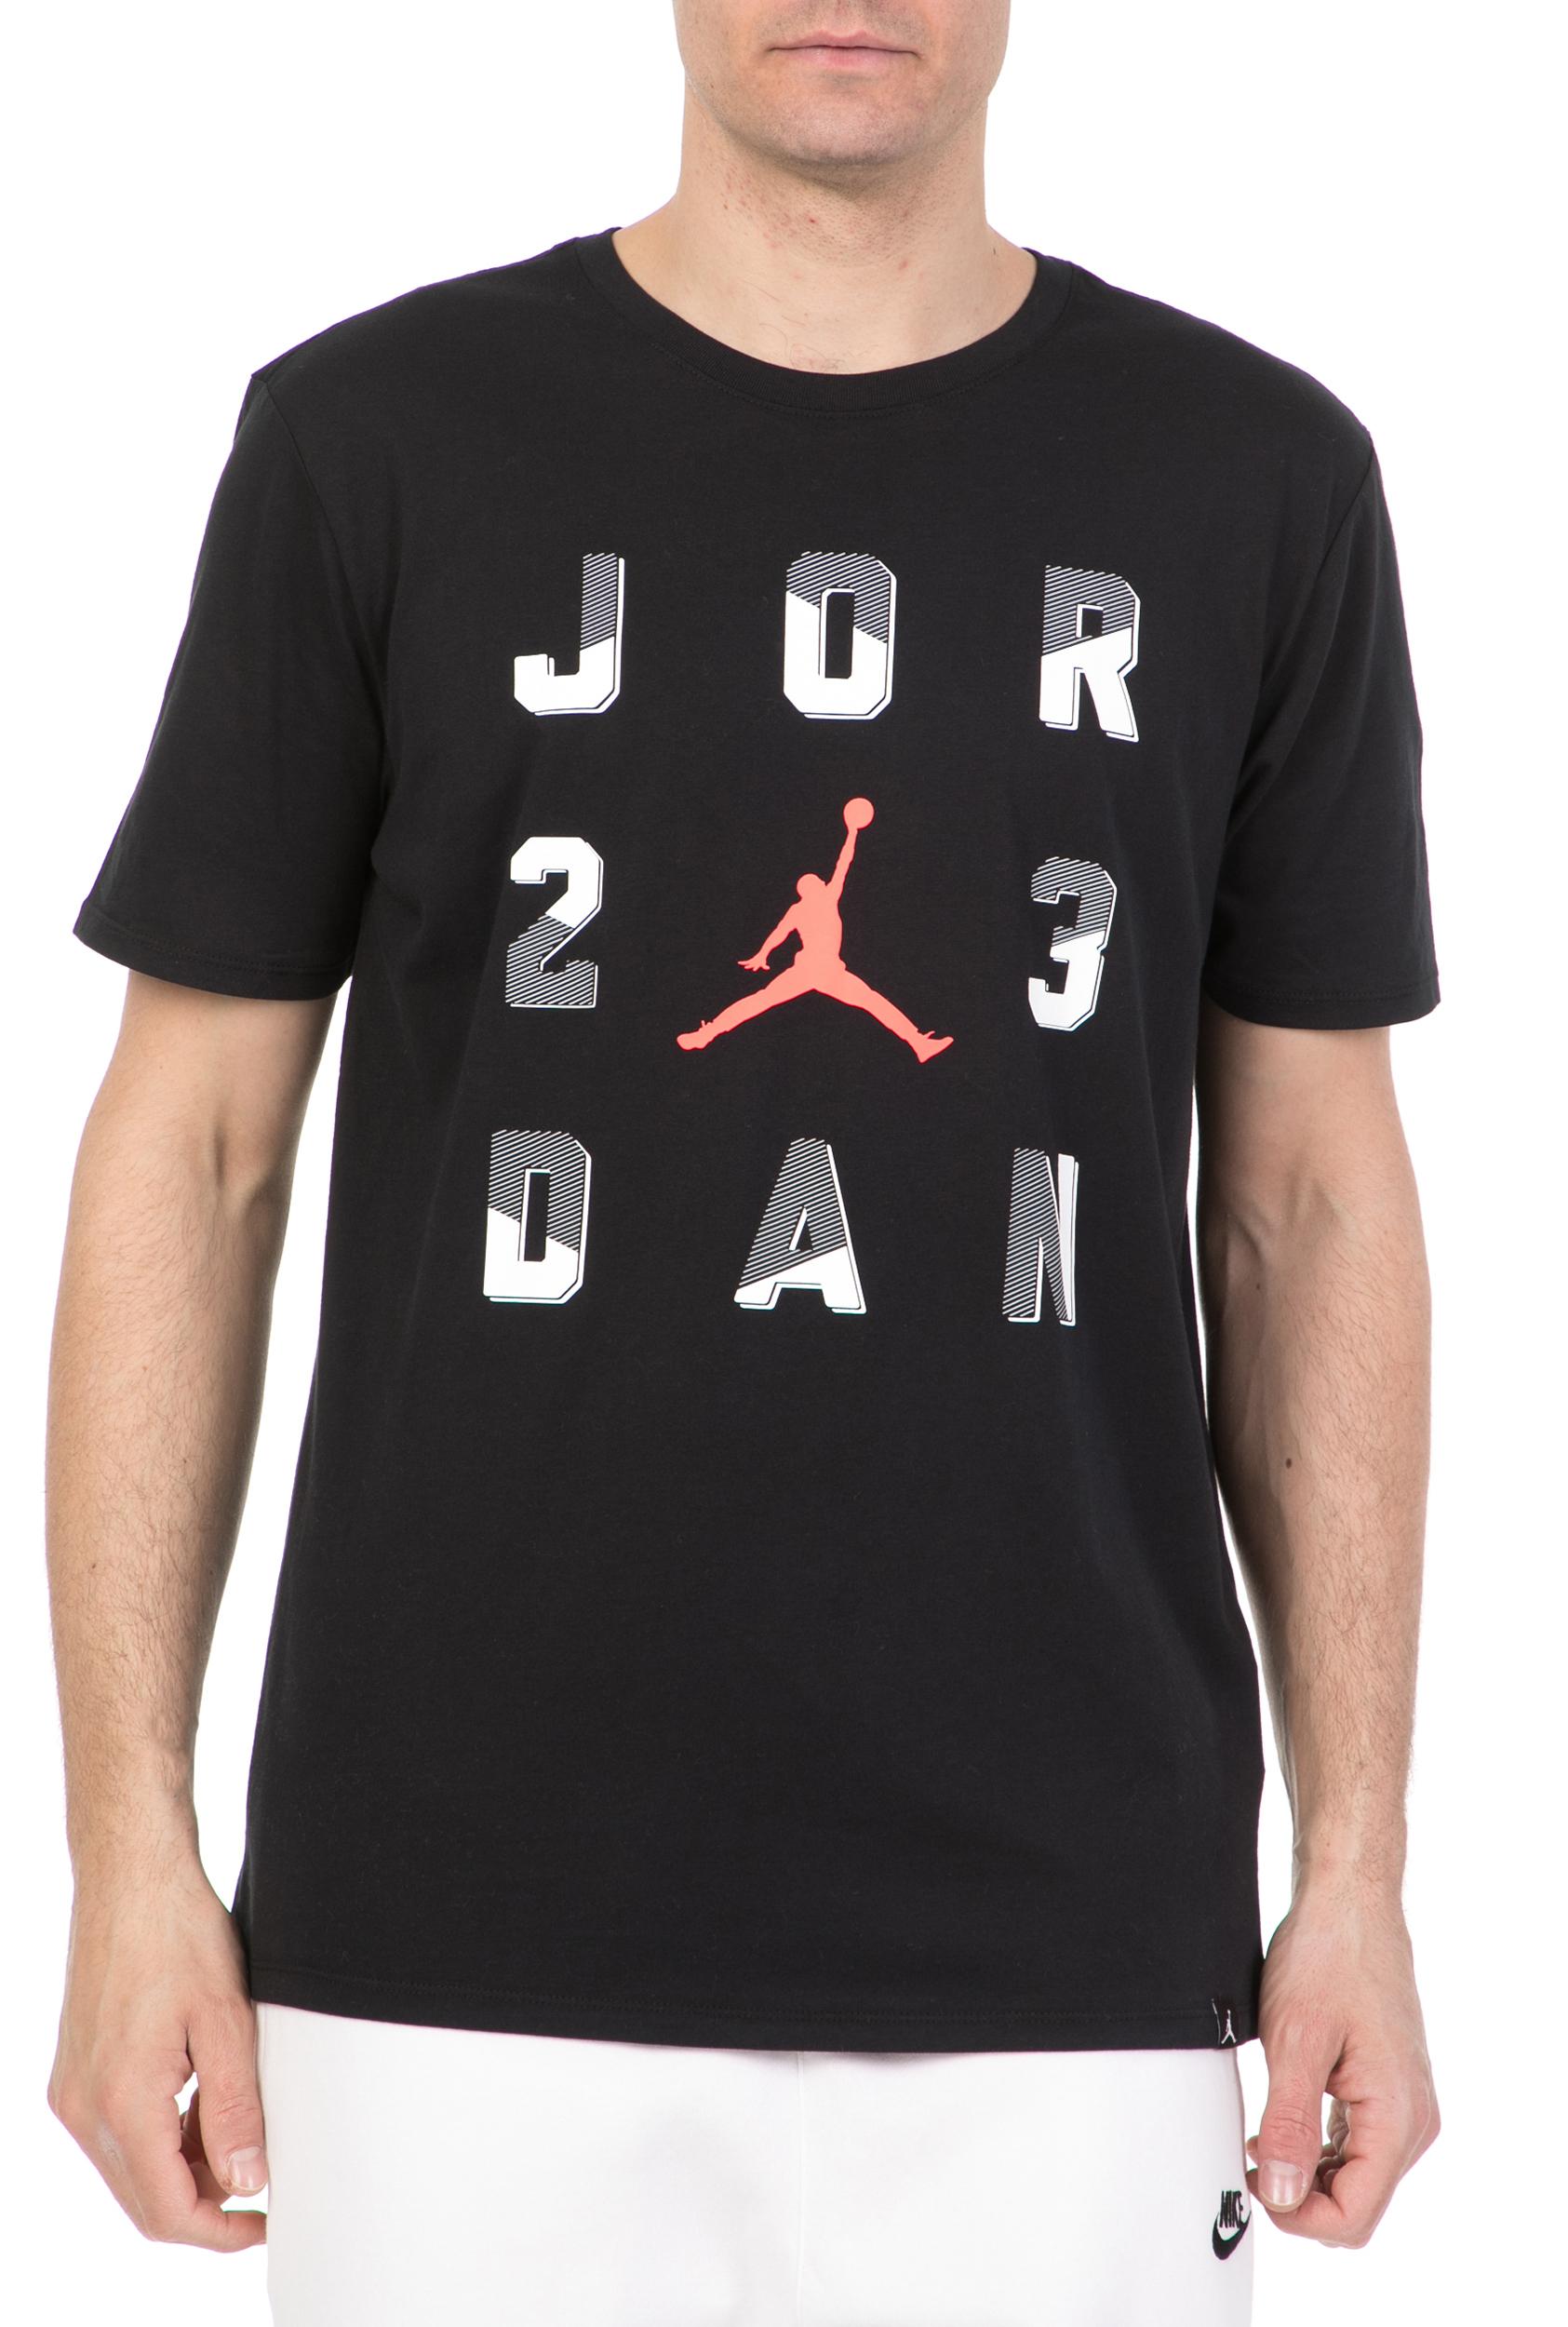 a28a6ef983d3 Sport-loft NIKE - Ανδρική κοντομάνικη μπλούζα NIKE JSW JORDAN 23 μαύρη